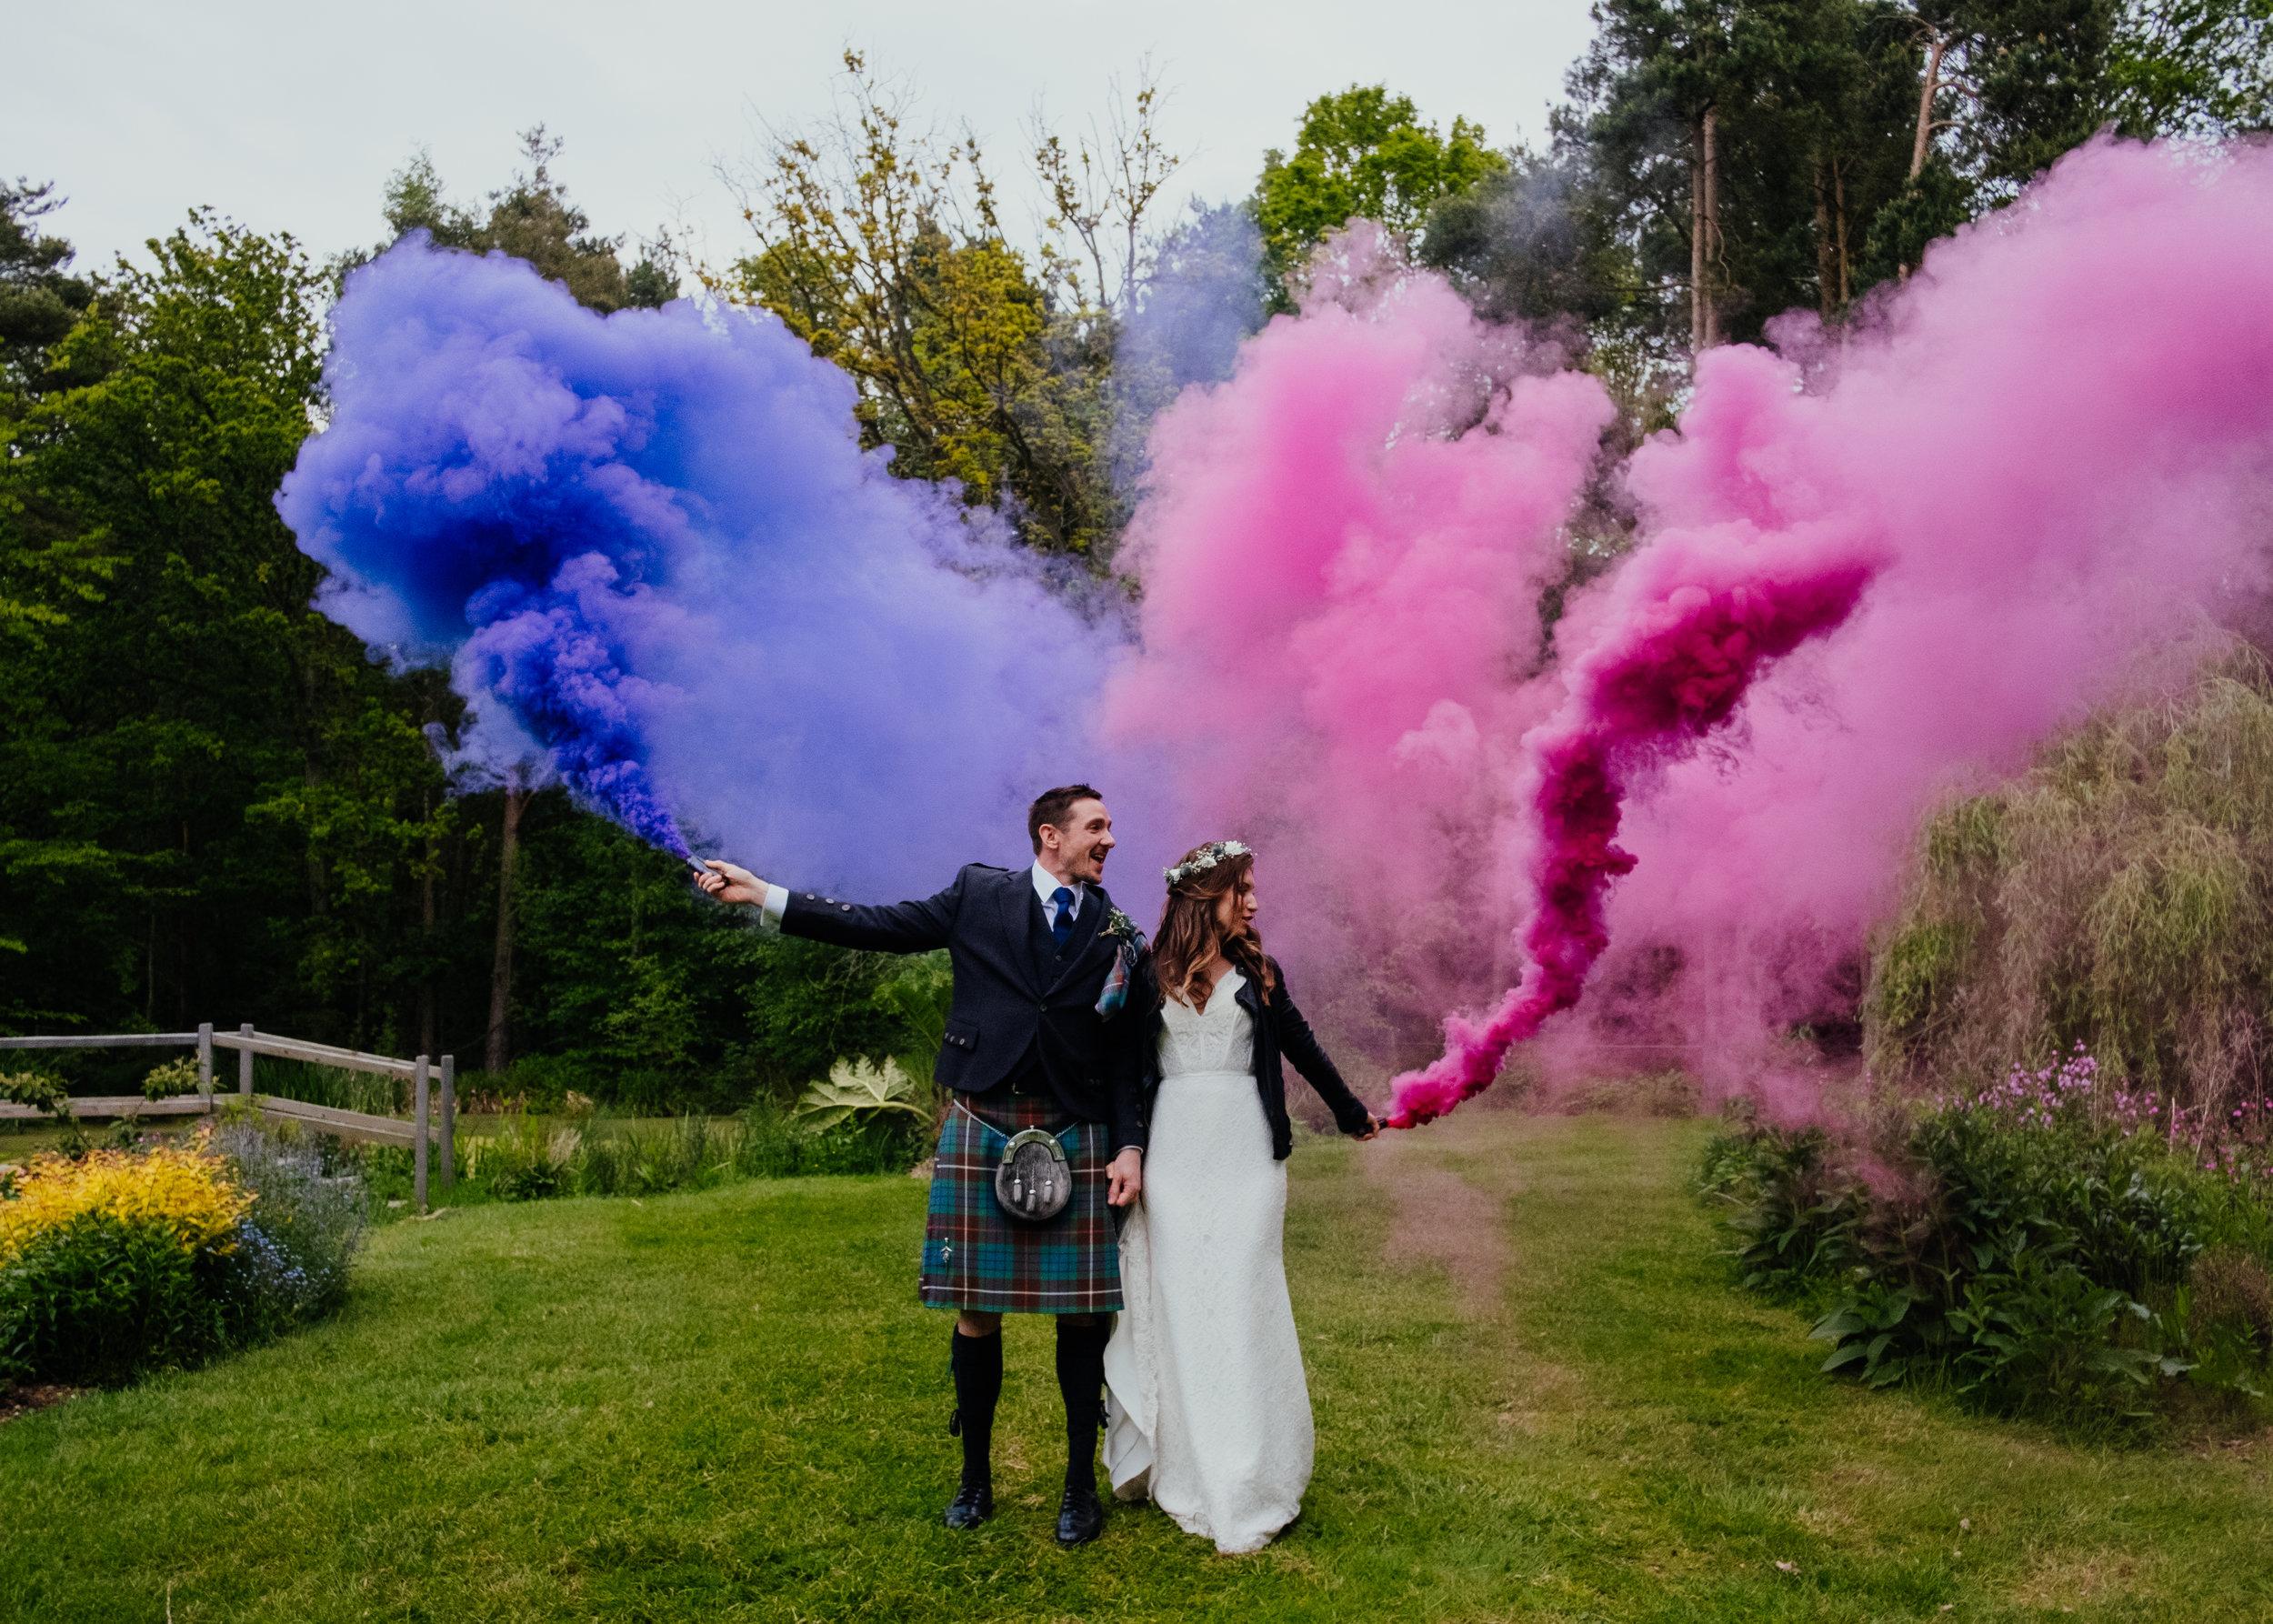 Captains Wood Barn wedding photography coloured smoke grenades